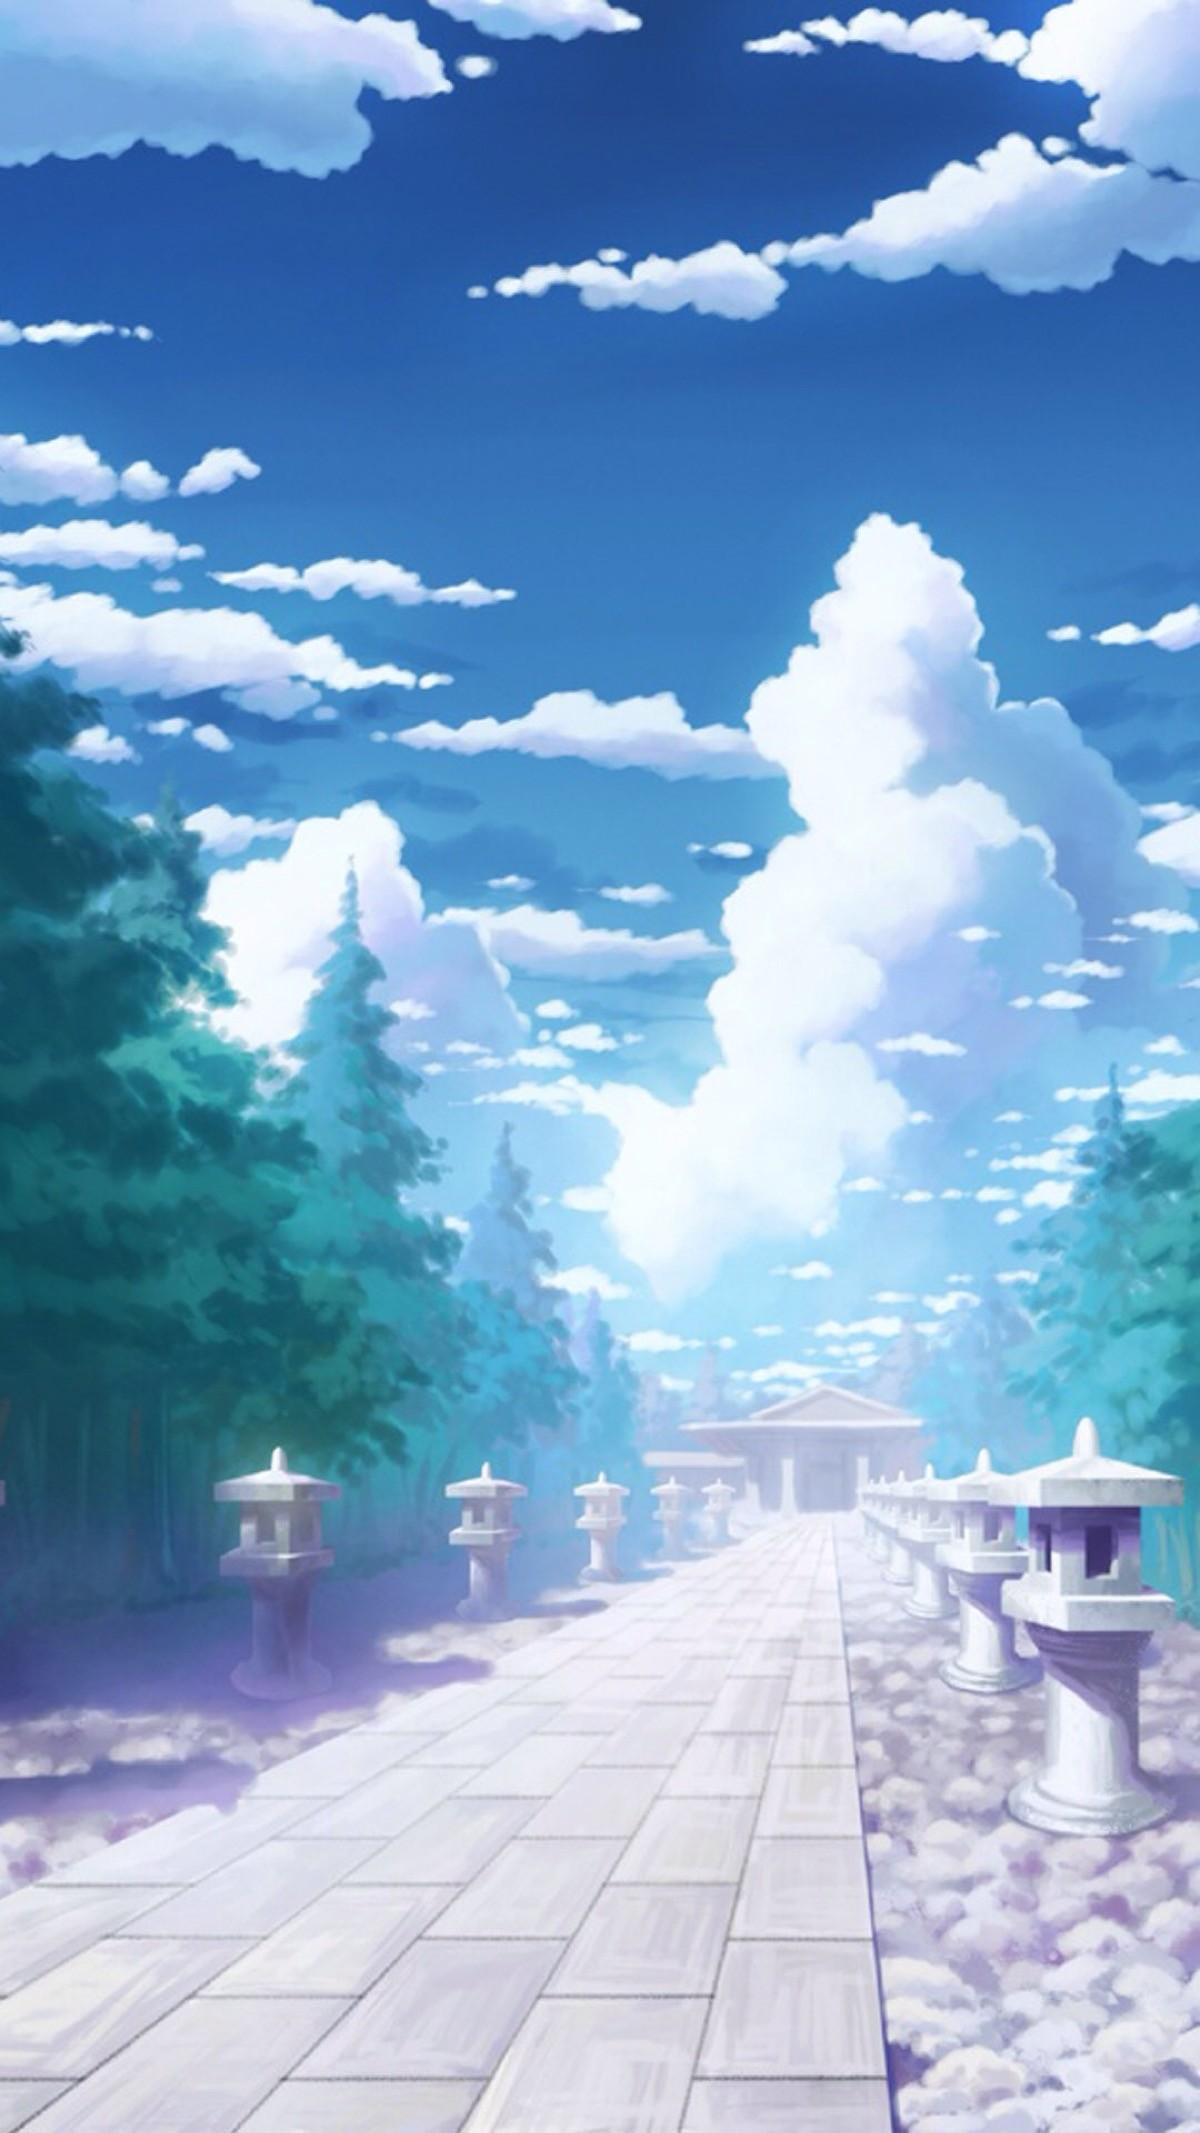 Master Anime Ecchi Picture Wallpapers City Anime Wallpapers Imagen Scenery  Original Art Ciudad Montain City Ocean